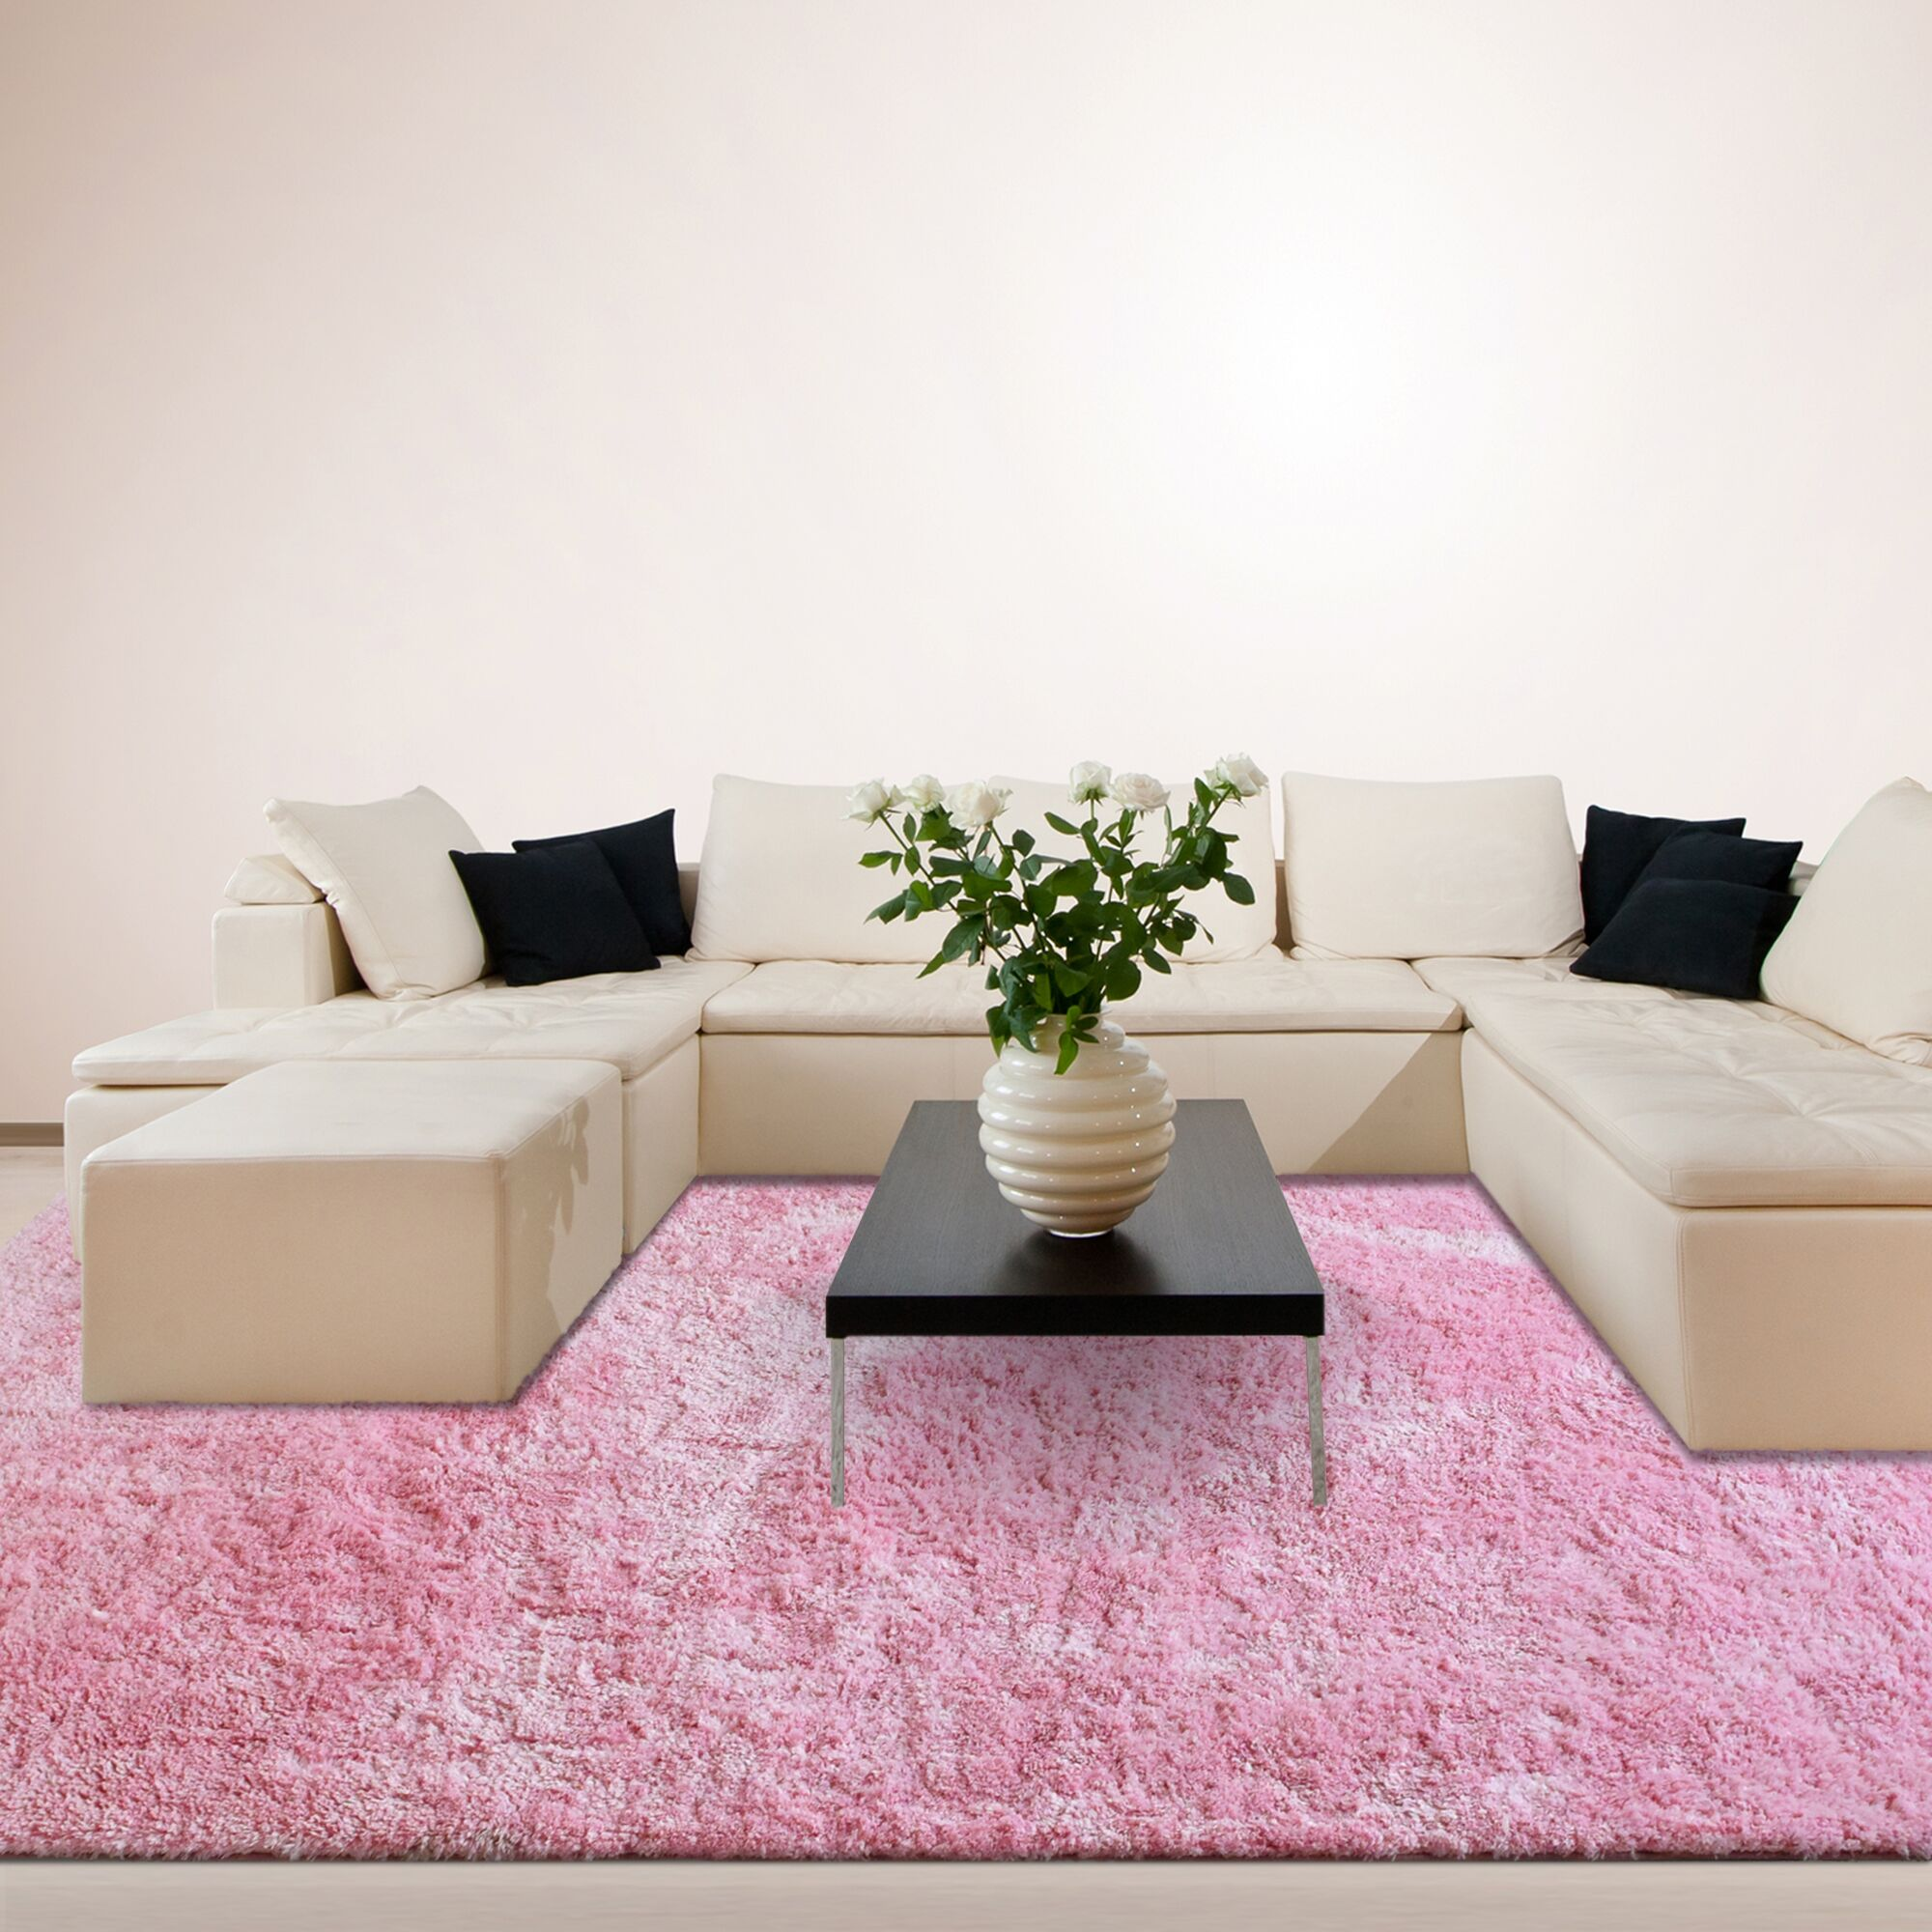 Fur Shag Pink Area Rug Rug Size: 8' x 10'